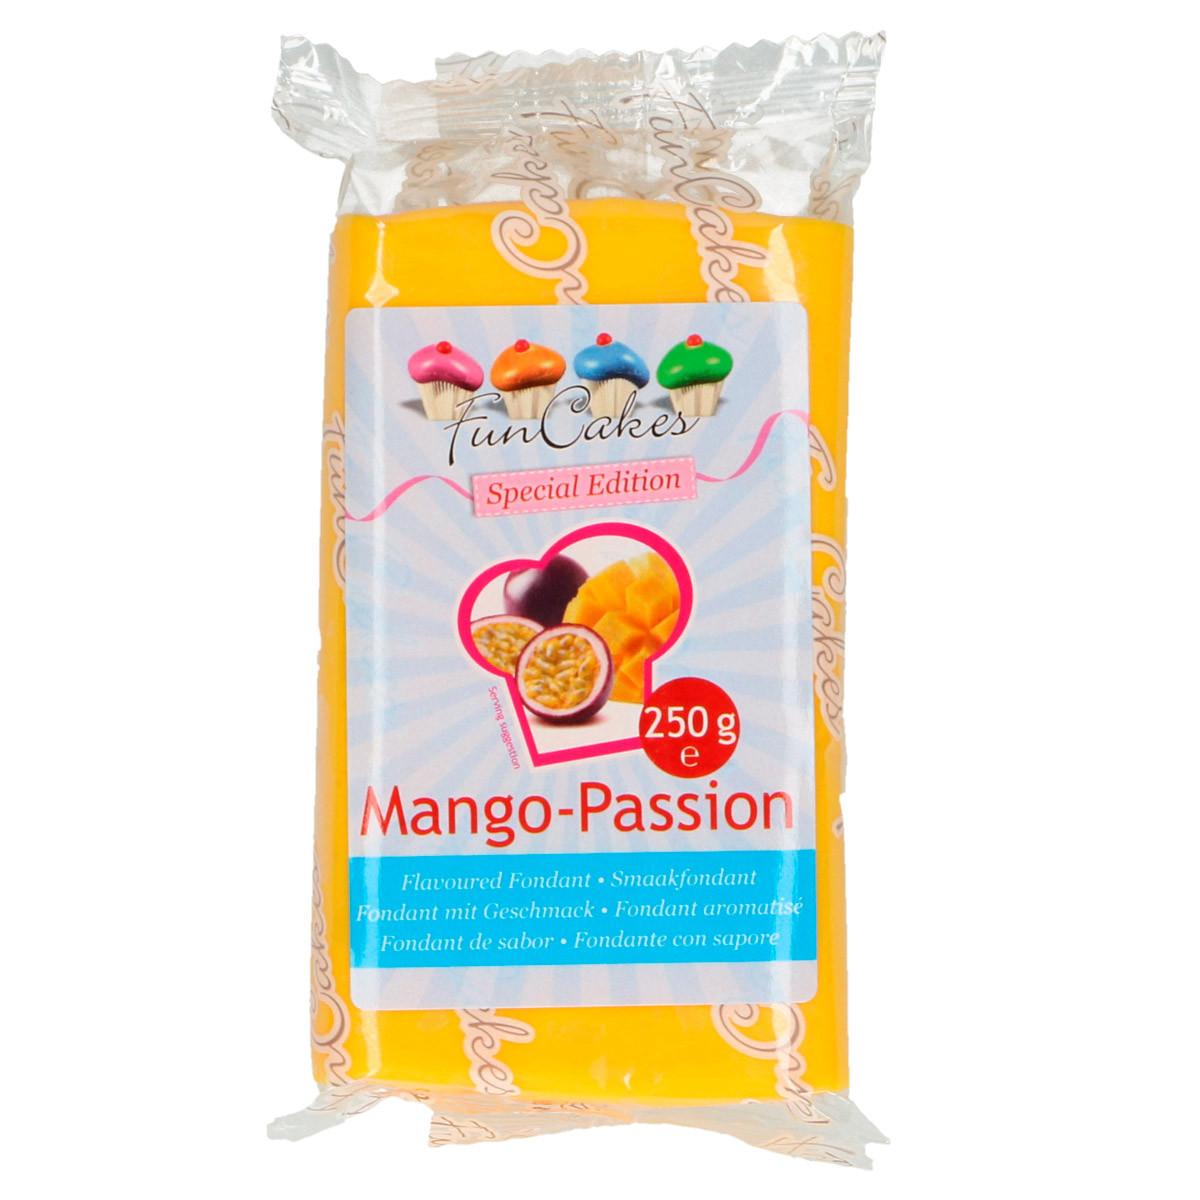 Geschmacks-Fondant, Mango-Passion